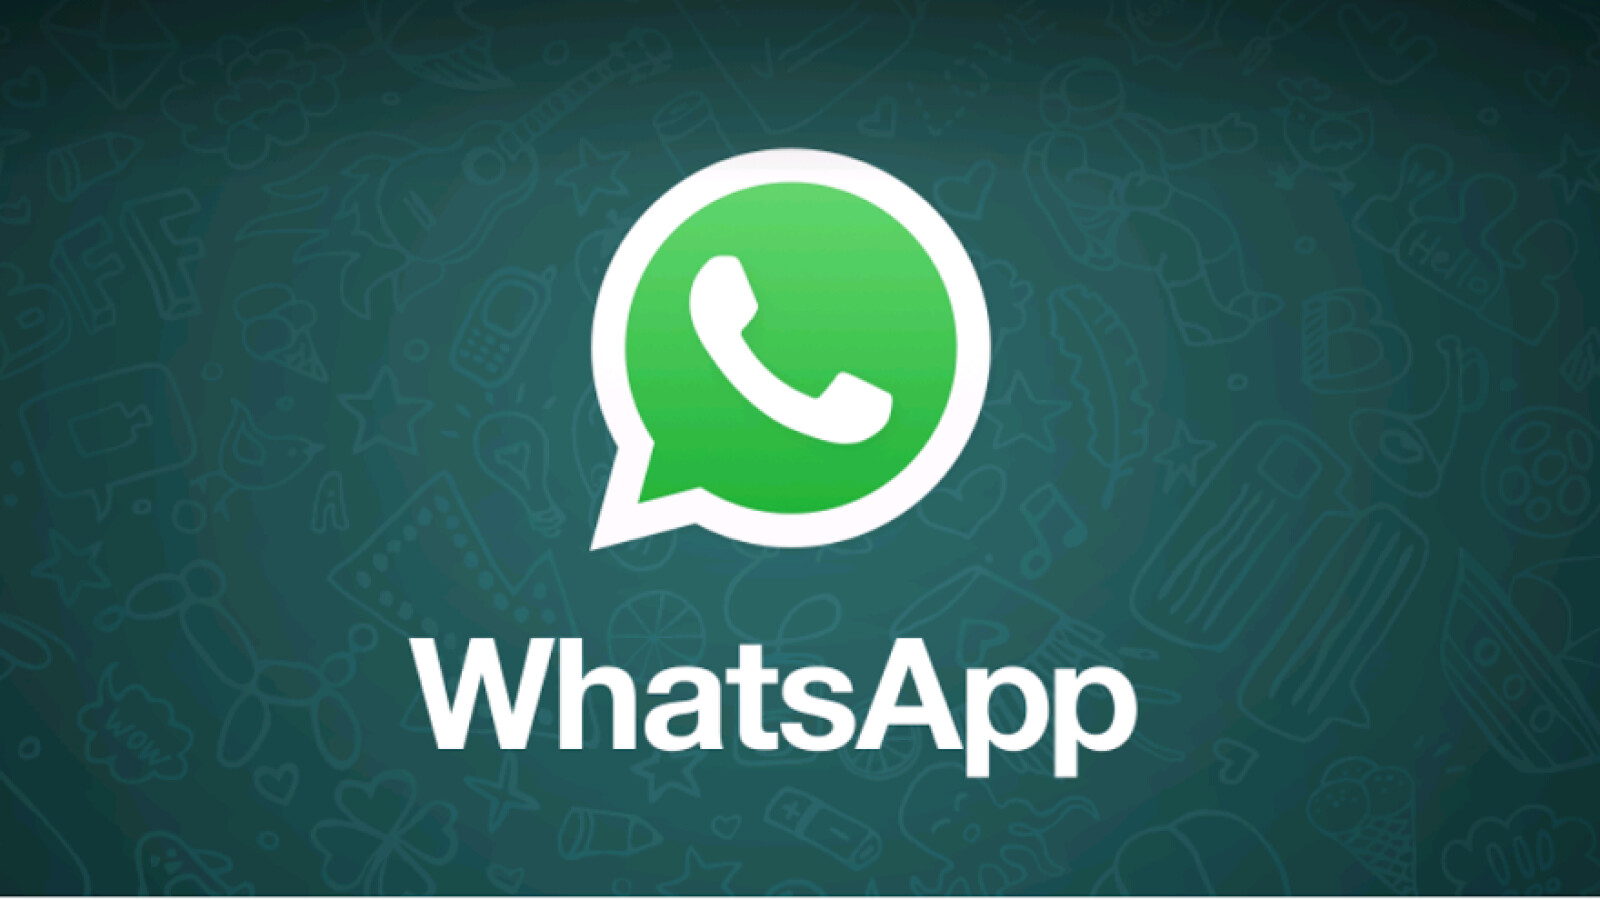 Profilbild whatsapp unscharf